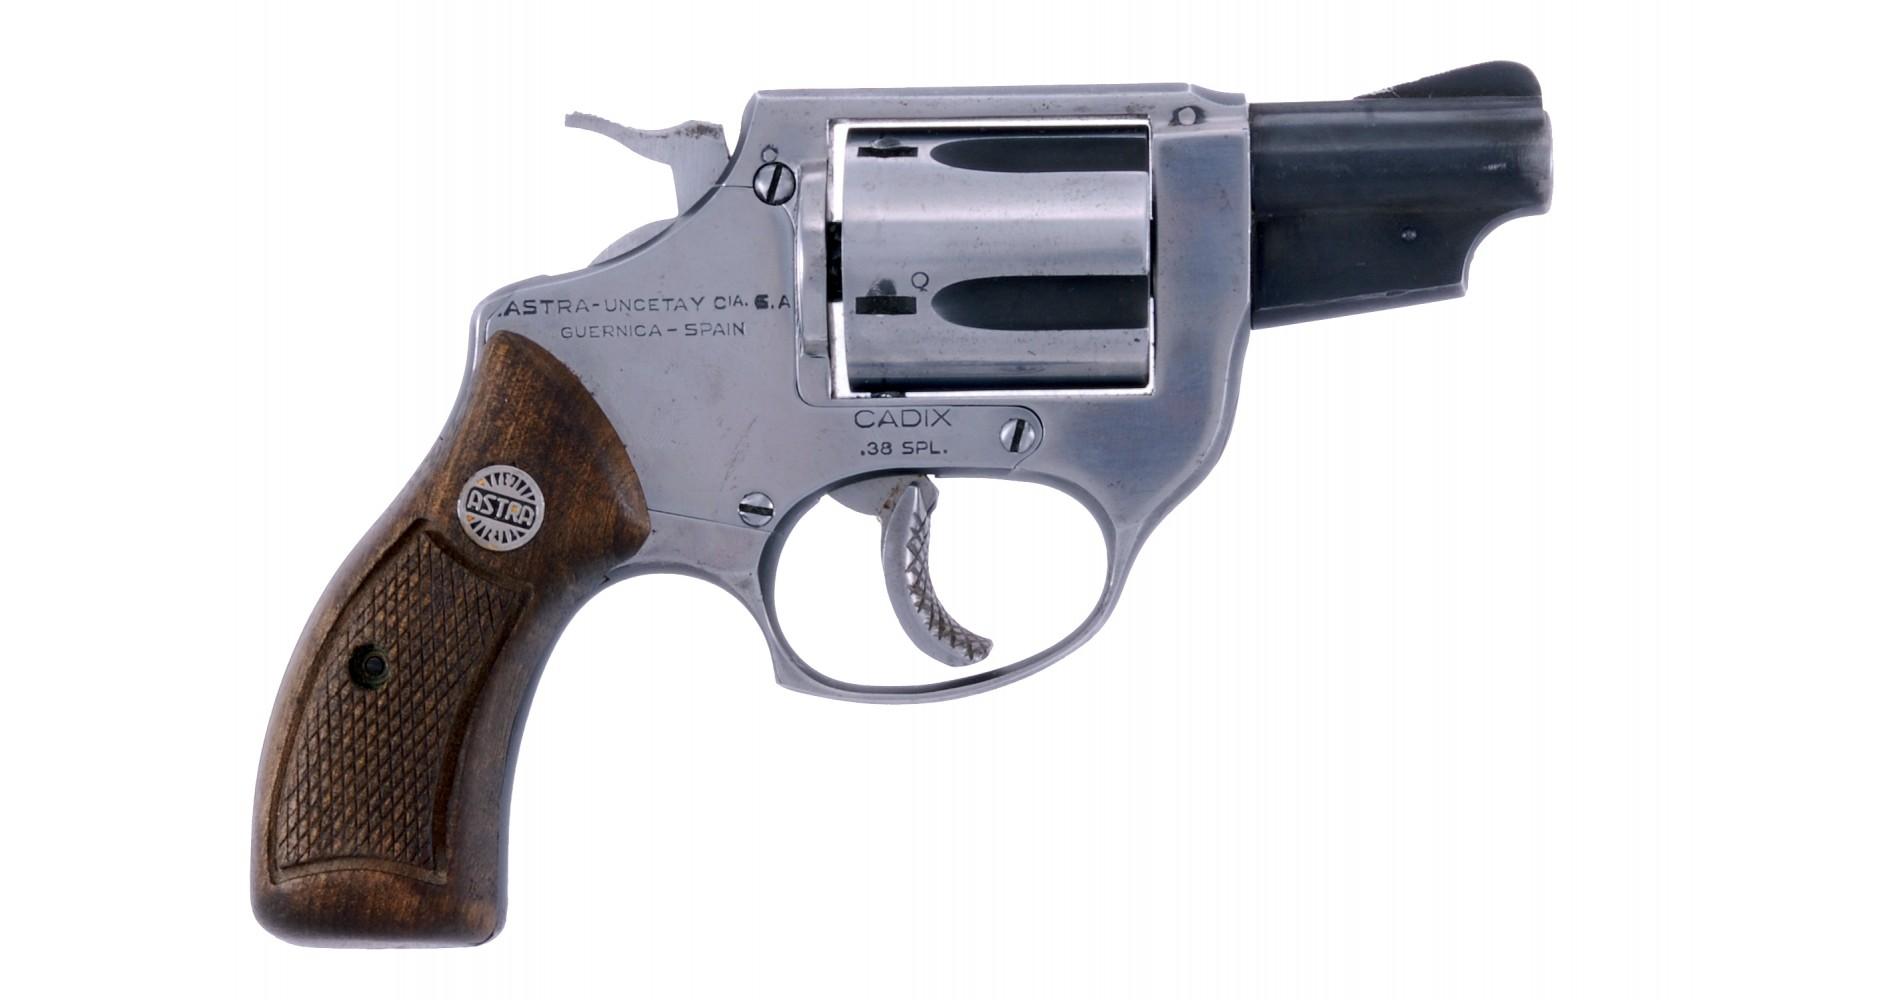 38 special gun: